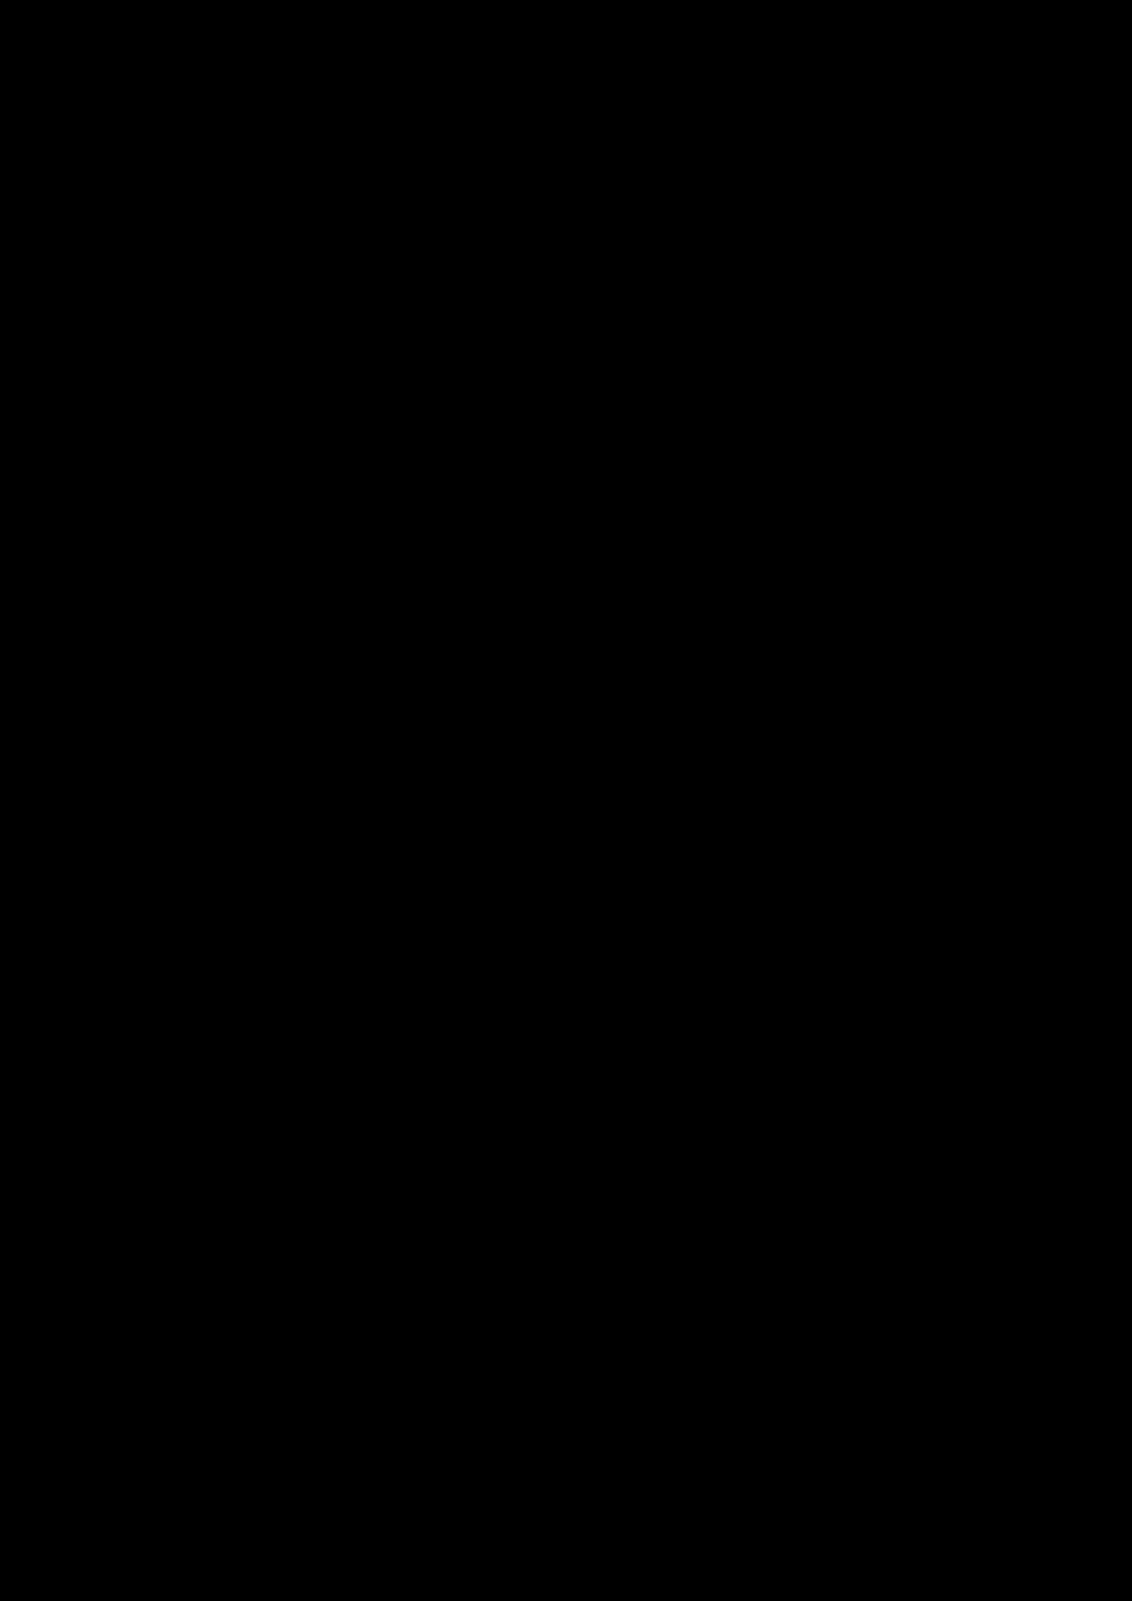 18 berez slide, Image 16